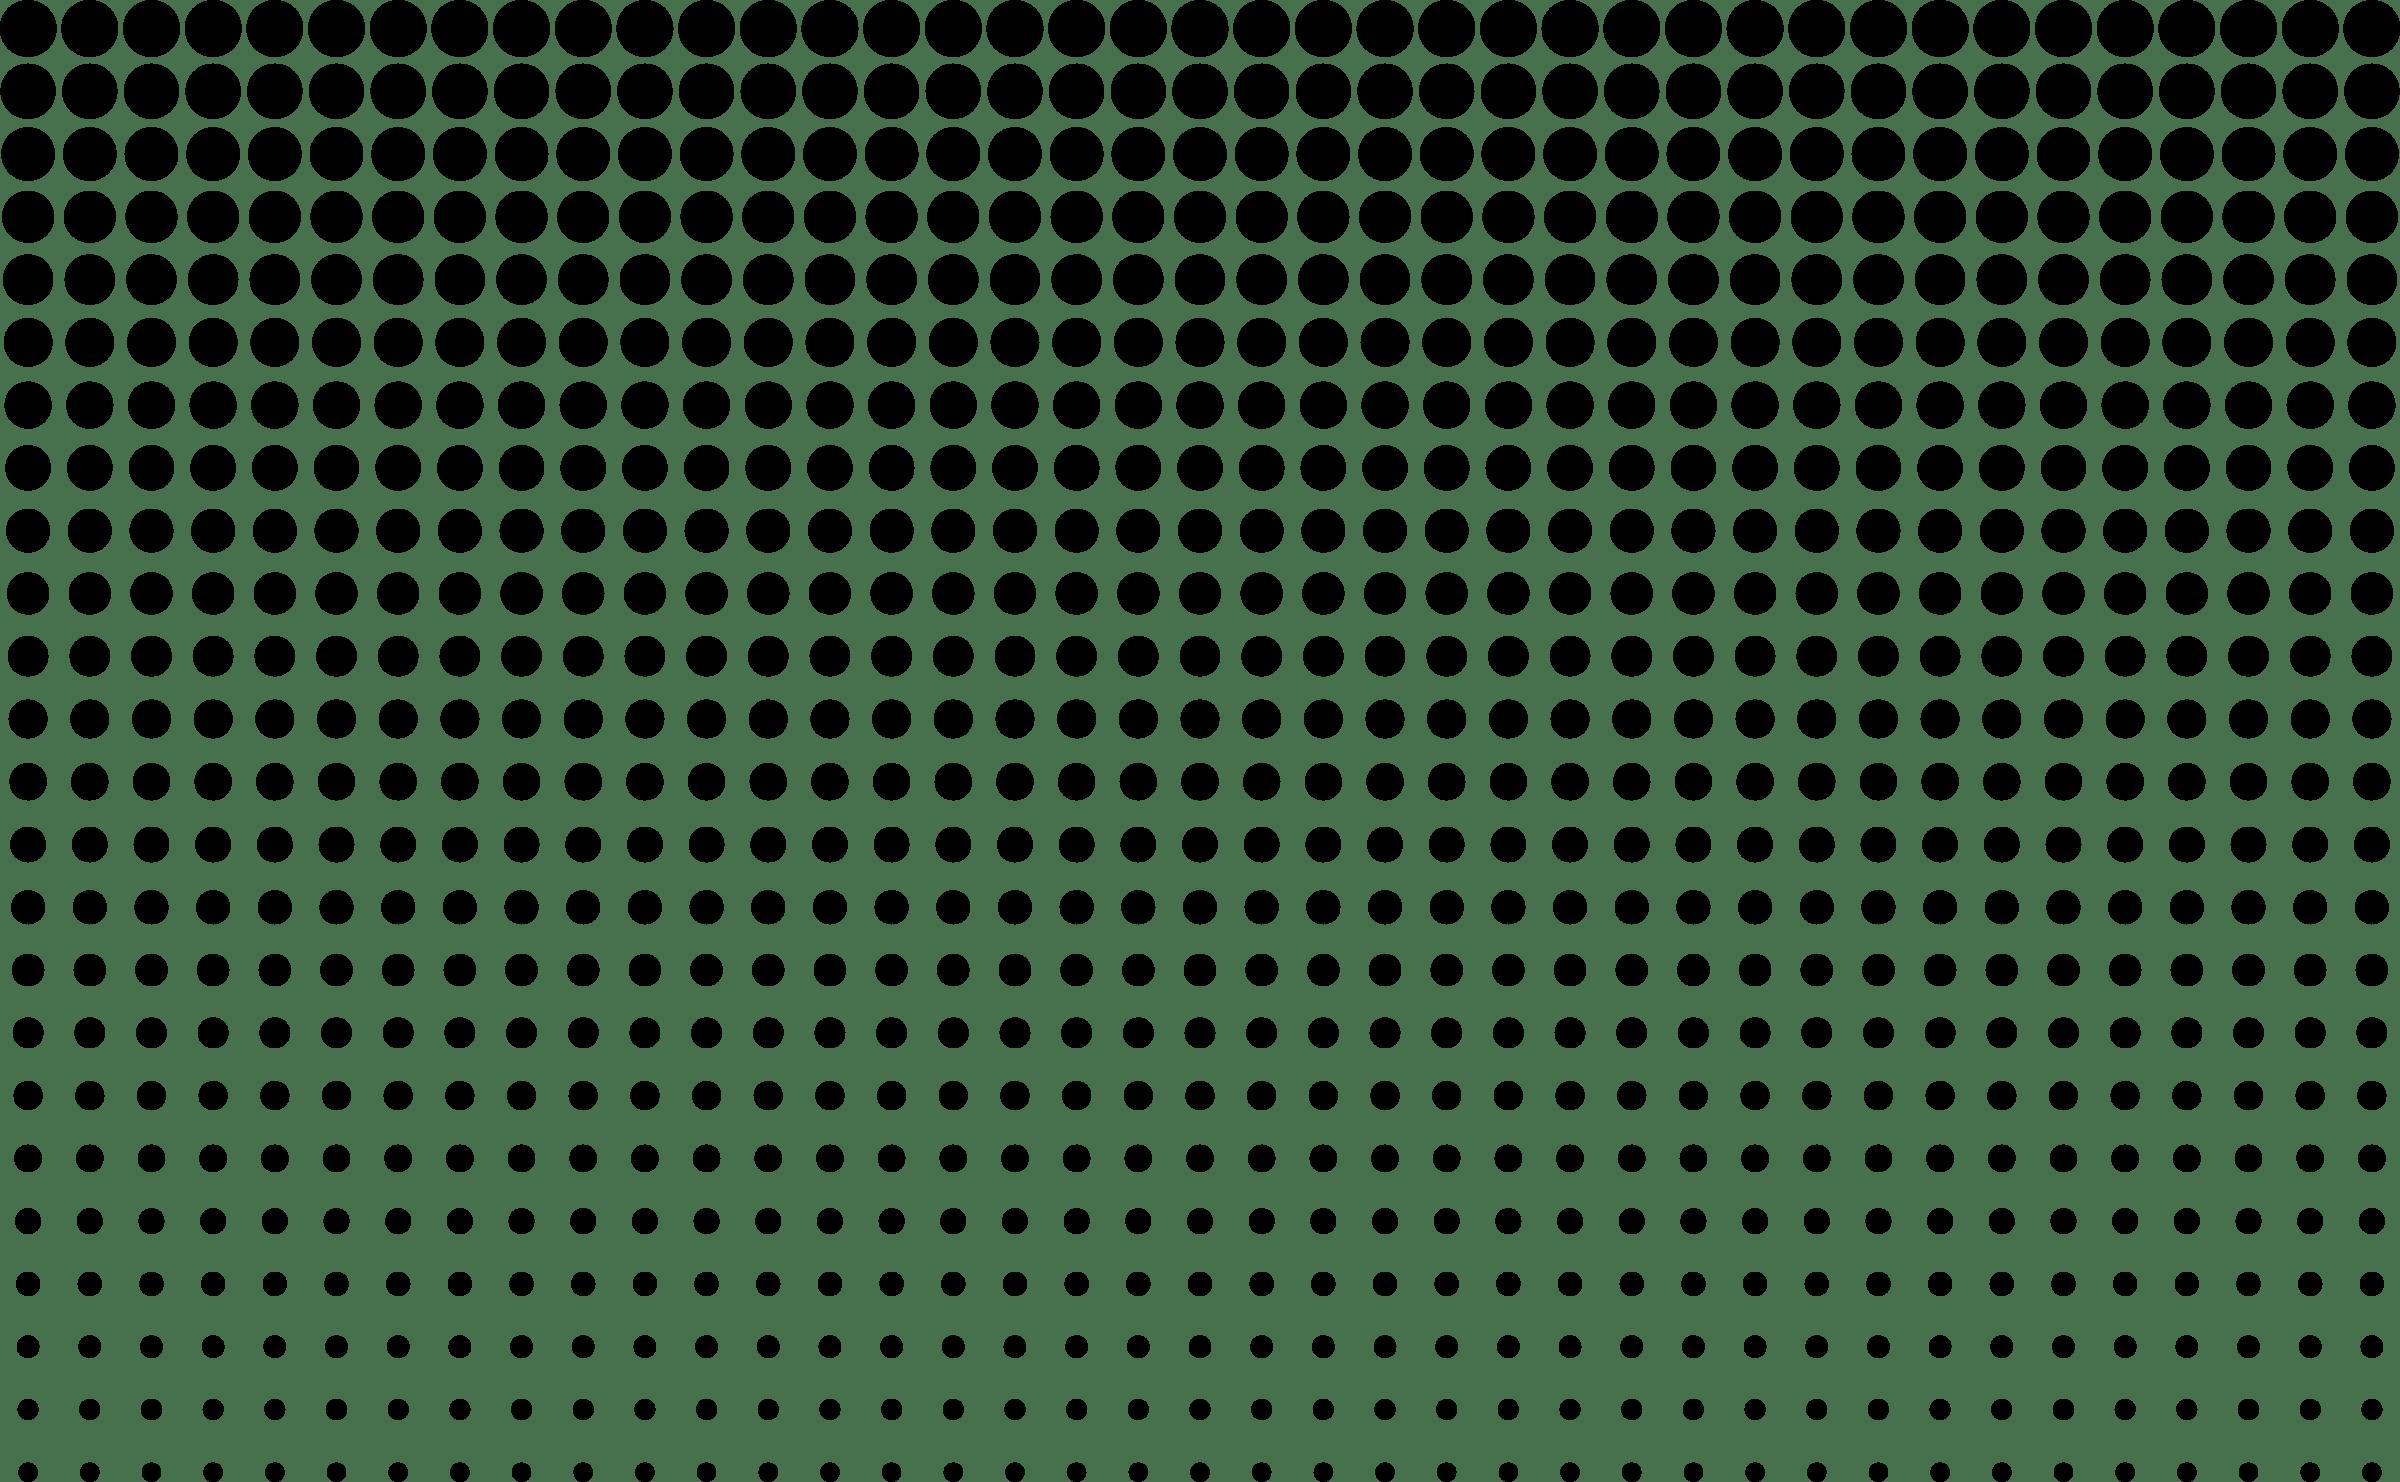 Dot Clipart Texture Vector Dot Texture Vector Transparent